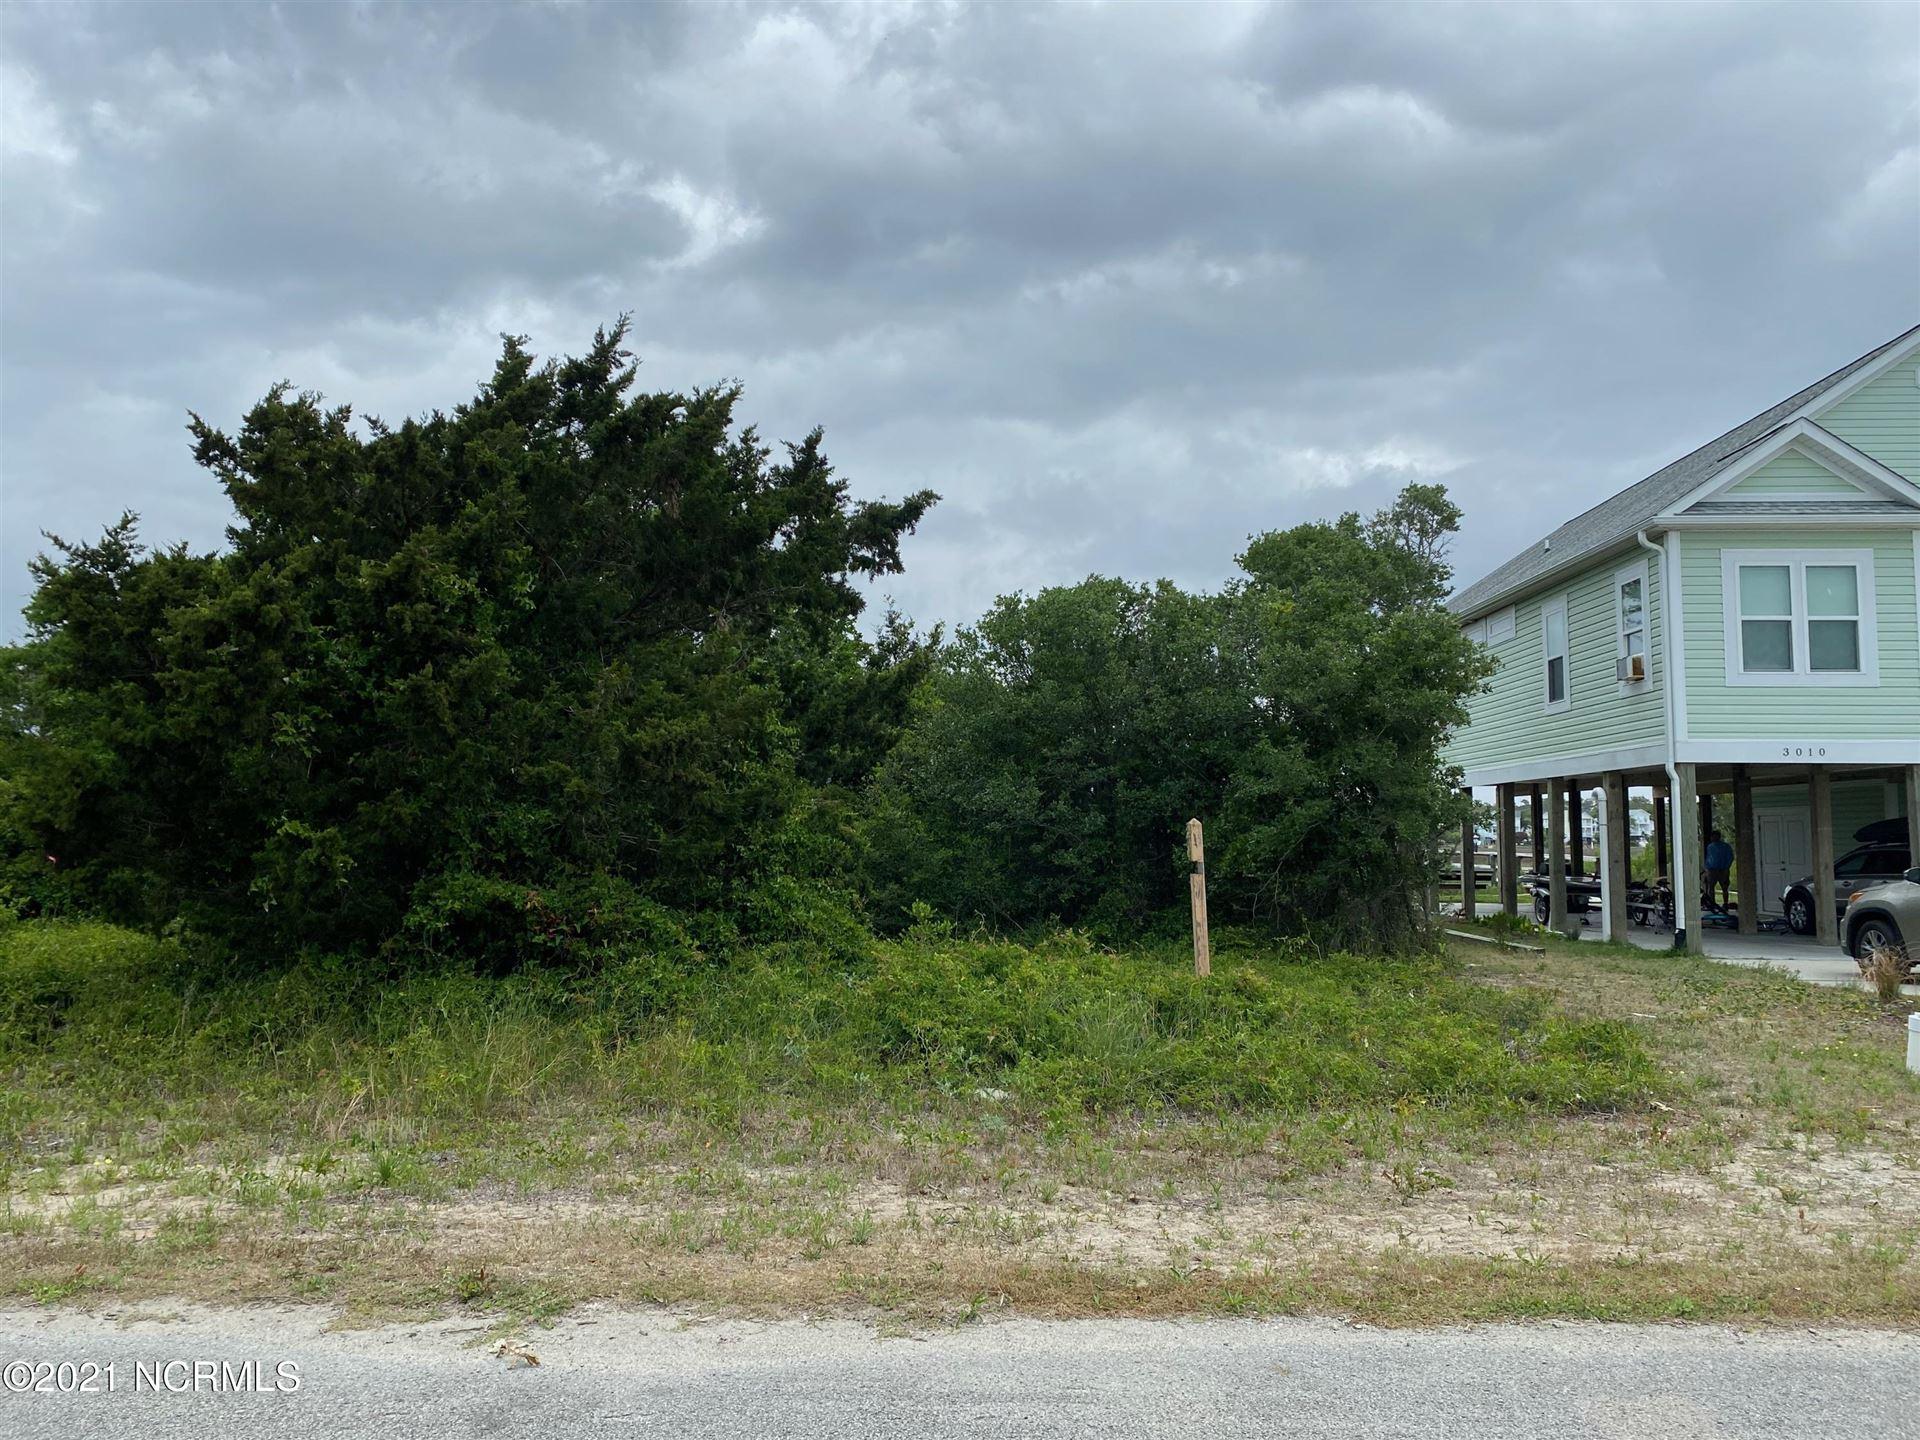 Photo of 3012 W Pelican Drive, Oak Island, NC 28465 (MLS # 100270316)